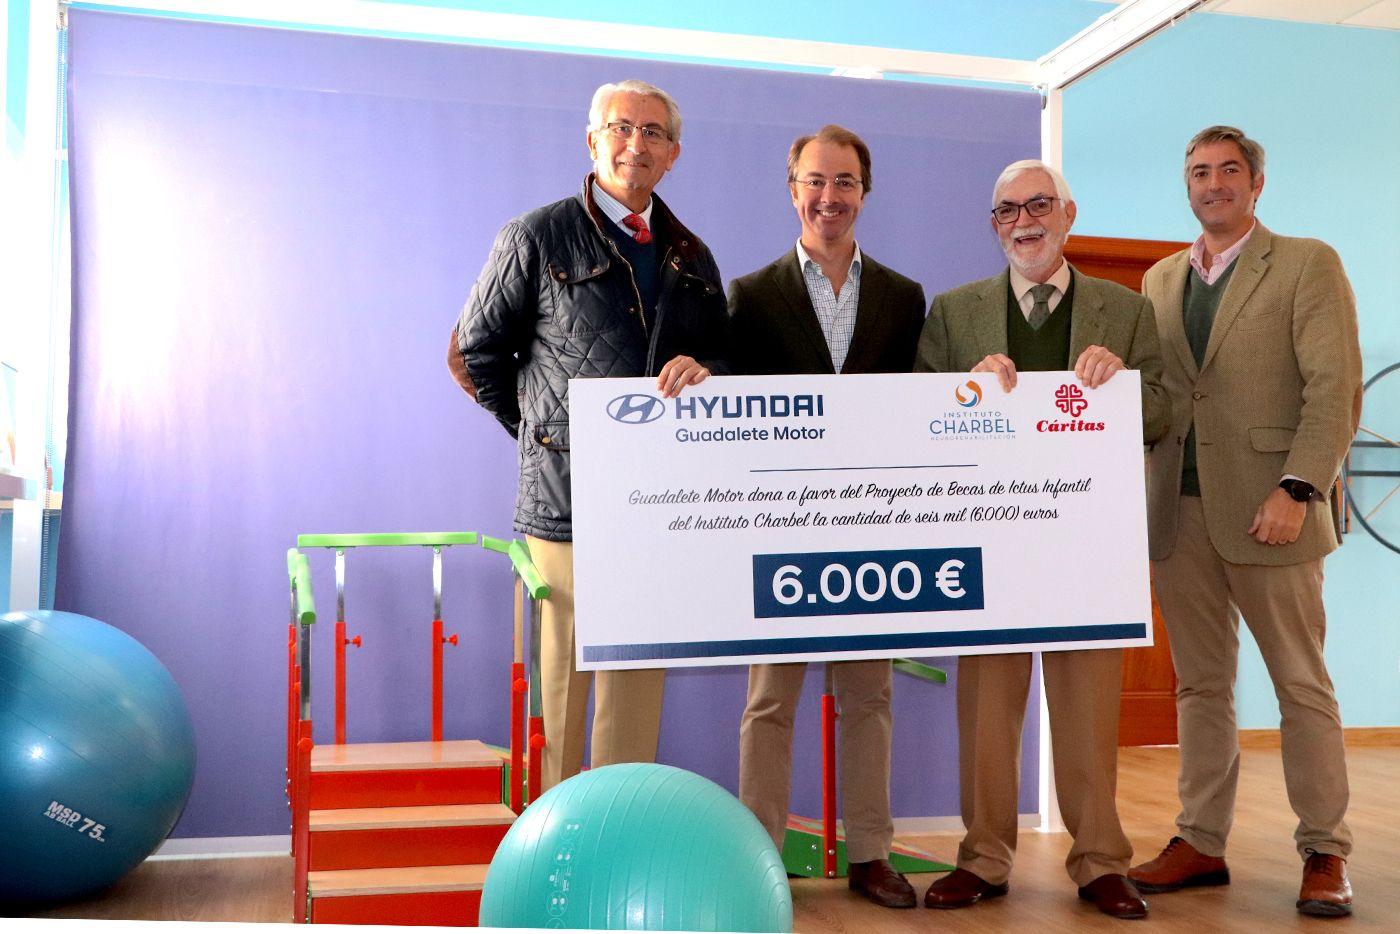 Guadalete Motor Hyundai dona 6.000 euros a las Becas Ictus Infantil